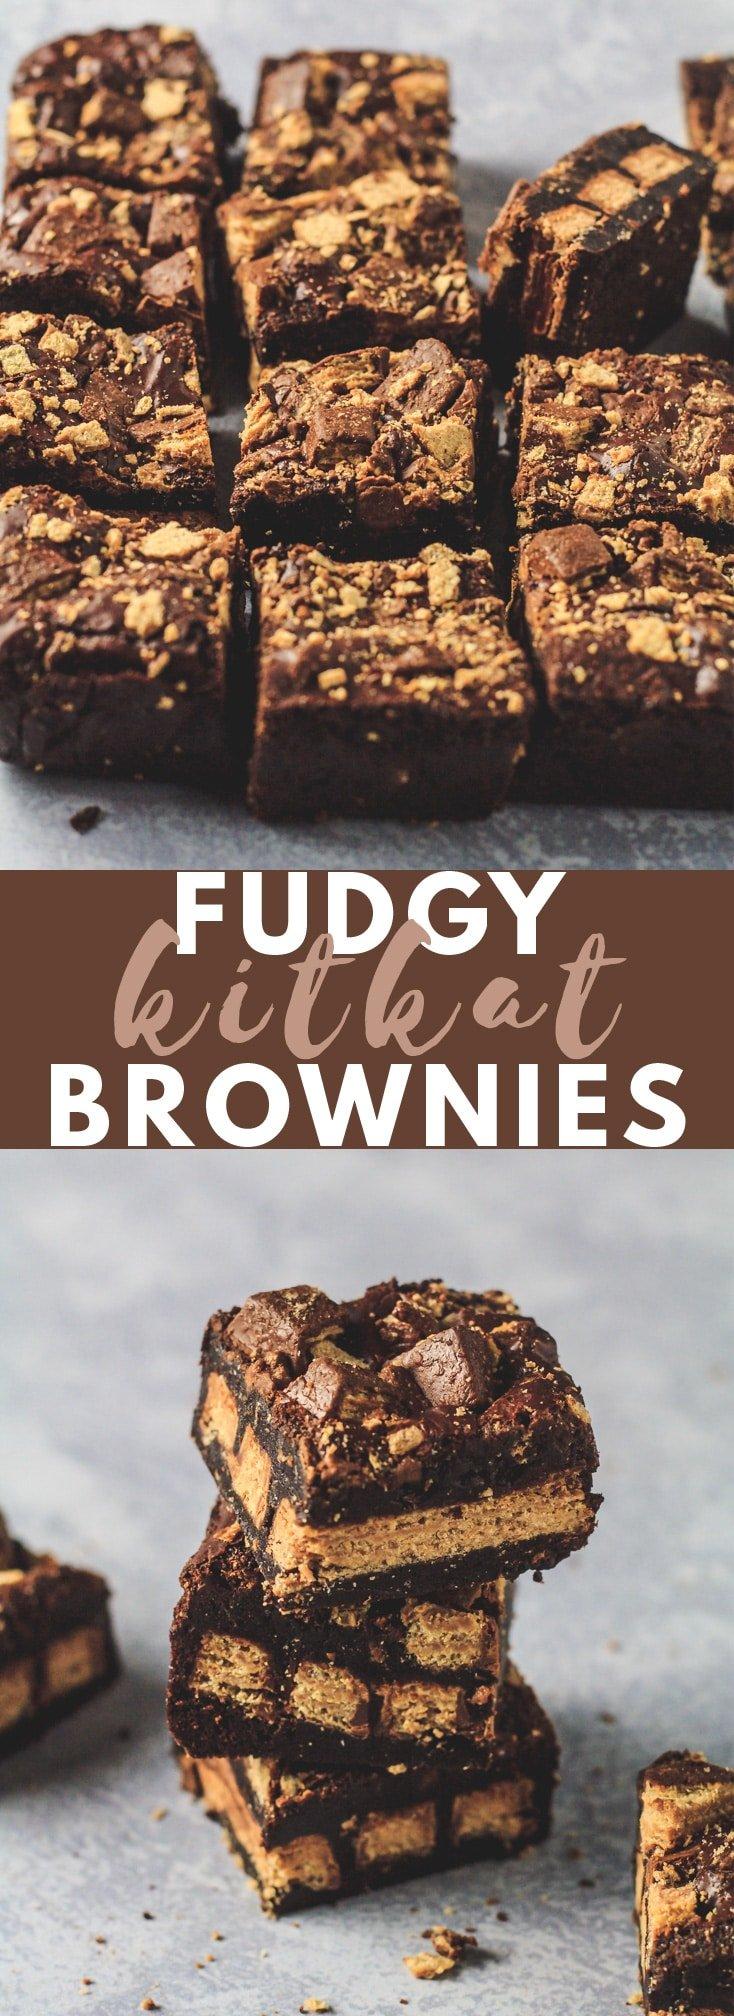 Fudgy KitKat Brownies